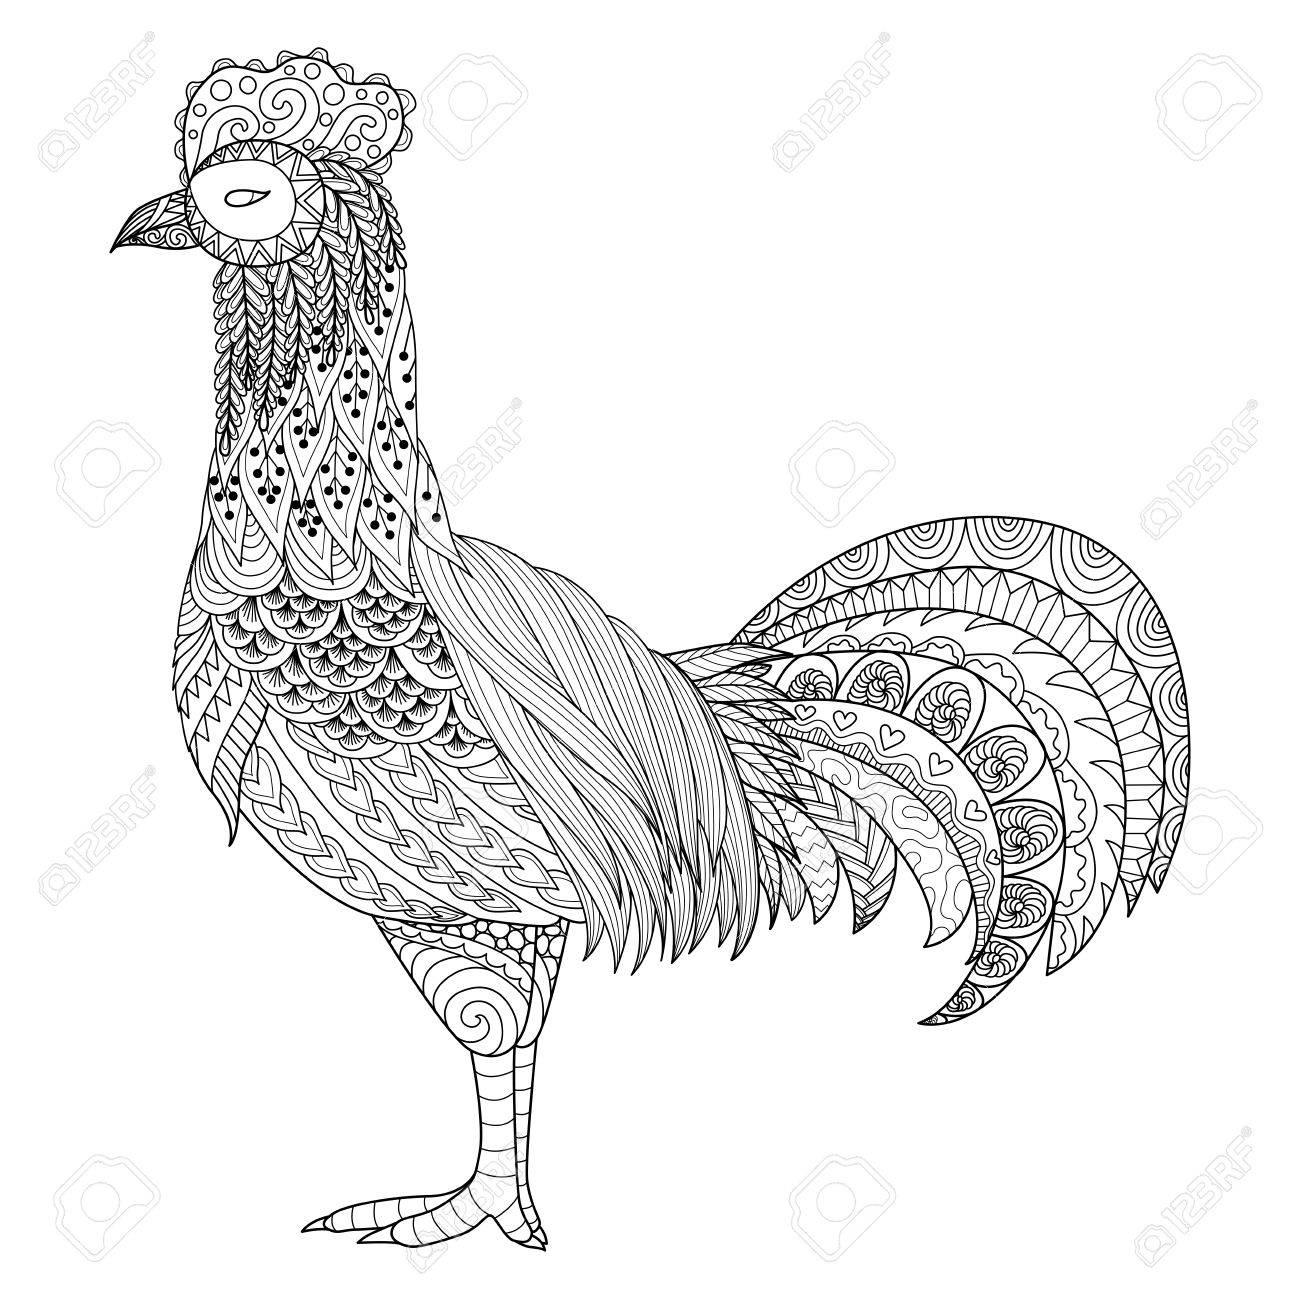 Contemporáneo Pollo Correr Para Colorear Ornamento - Enmarcado Para ...